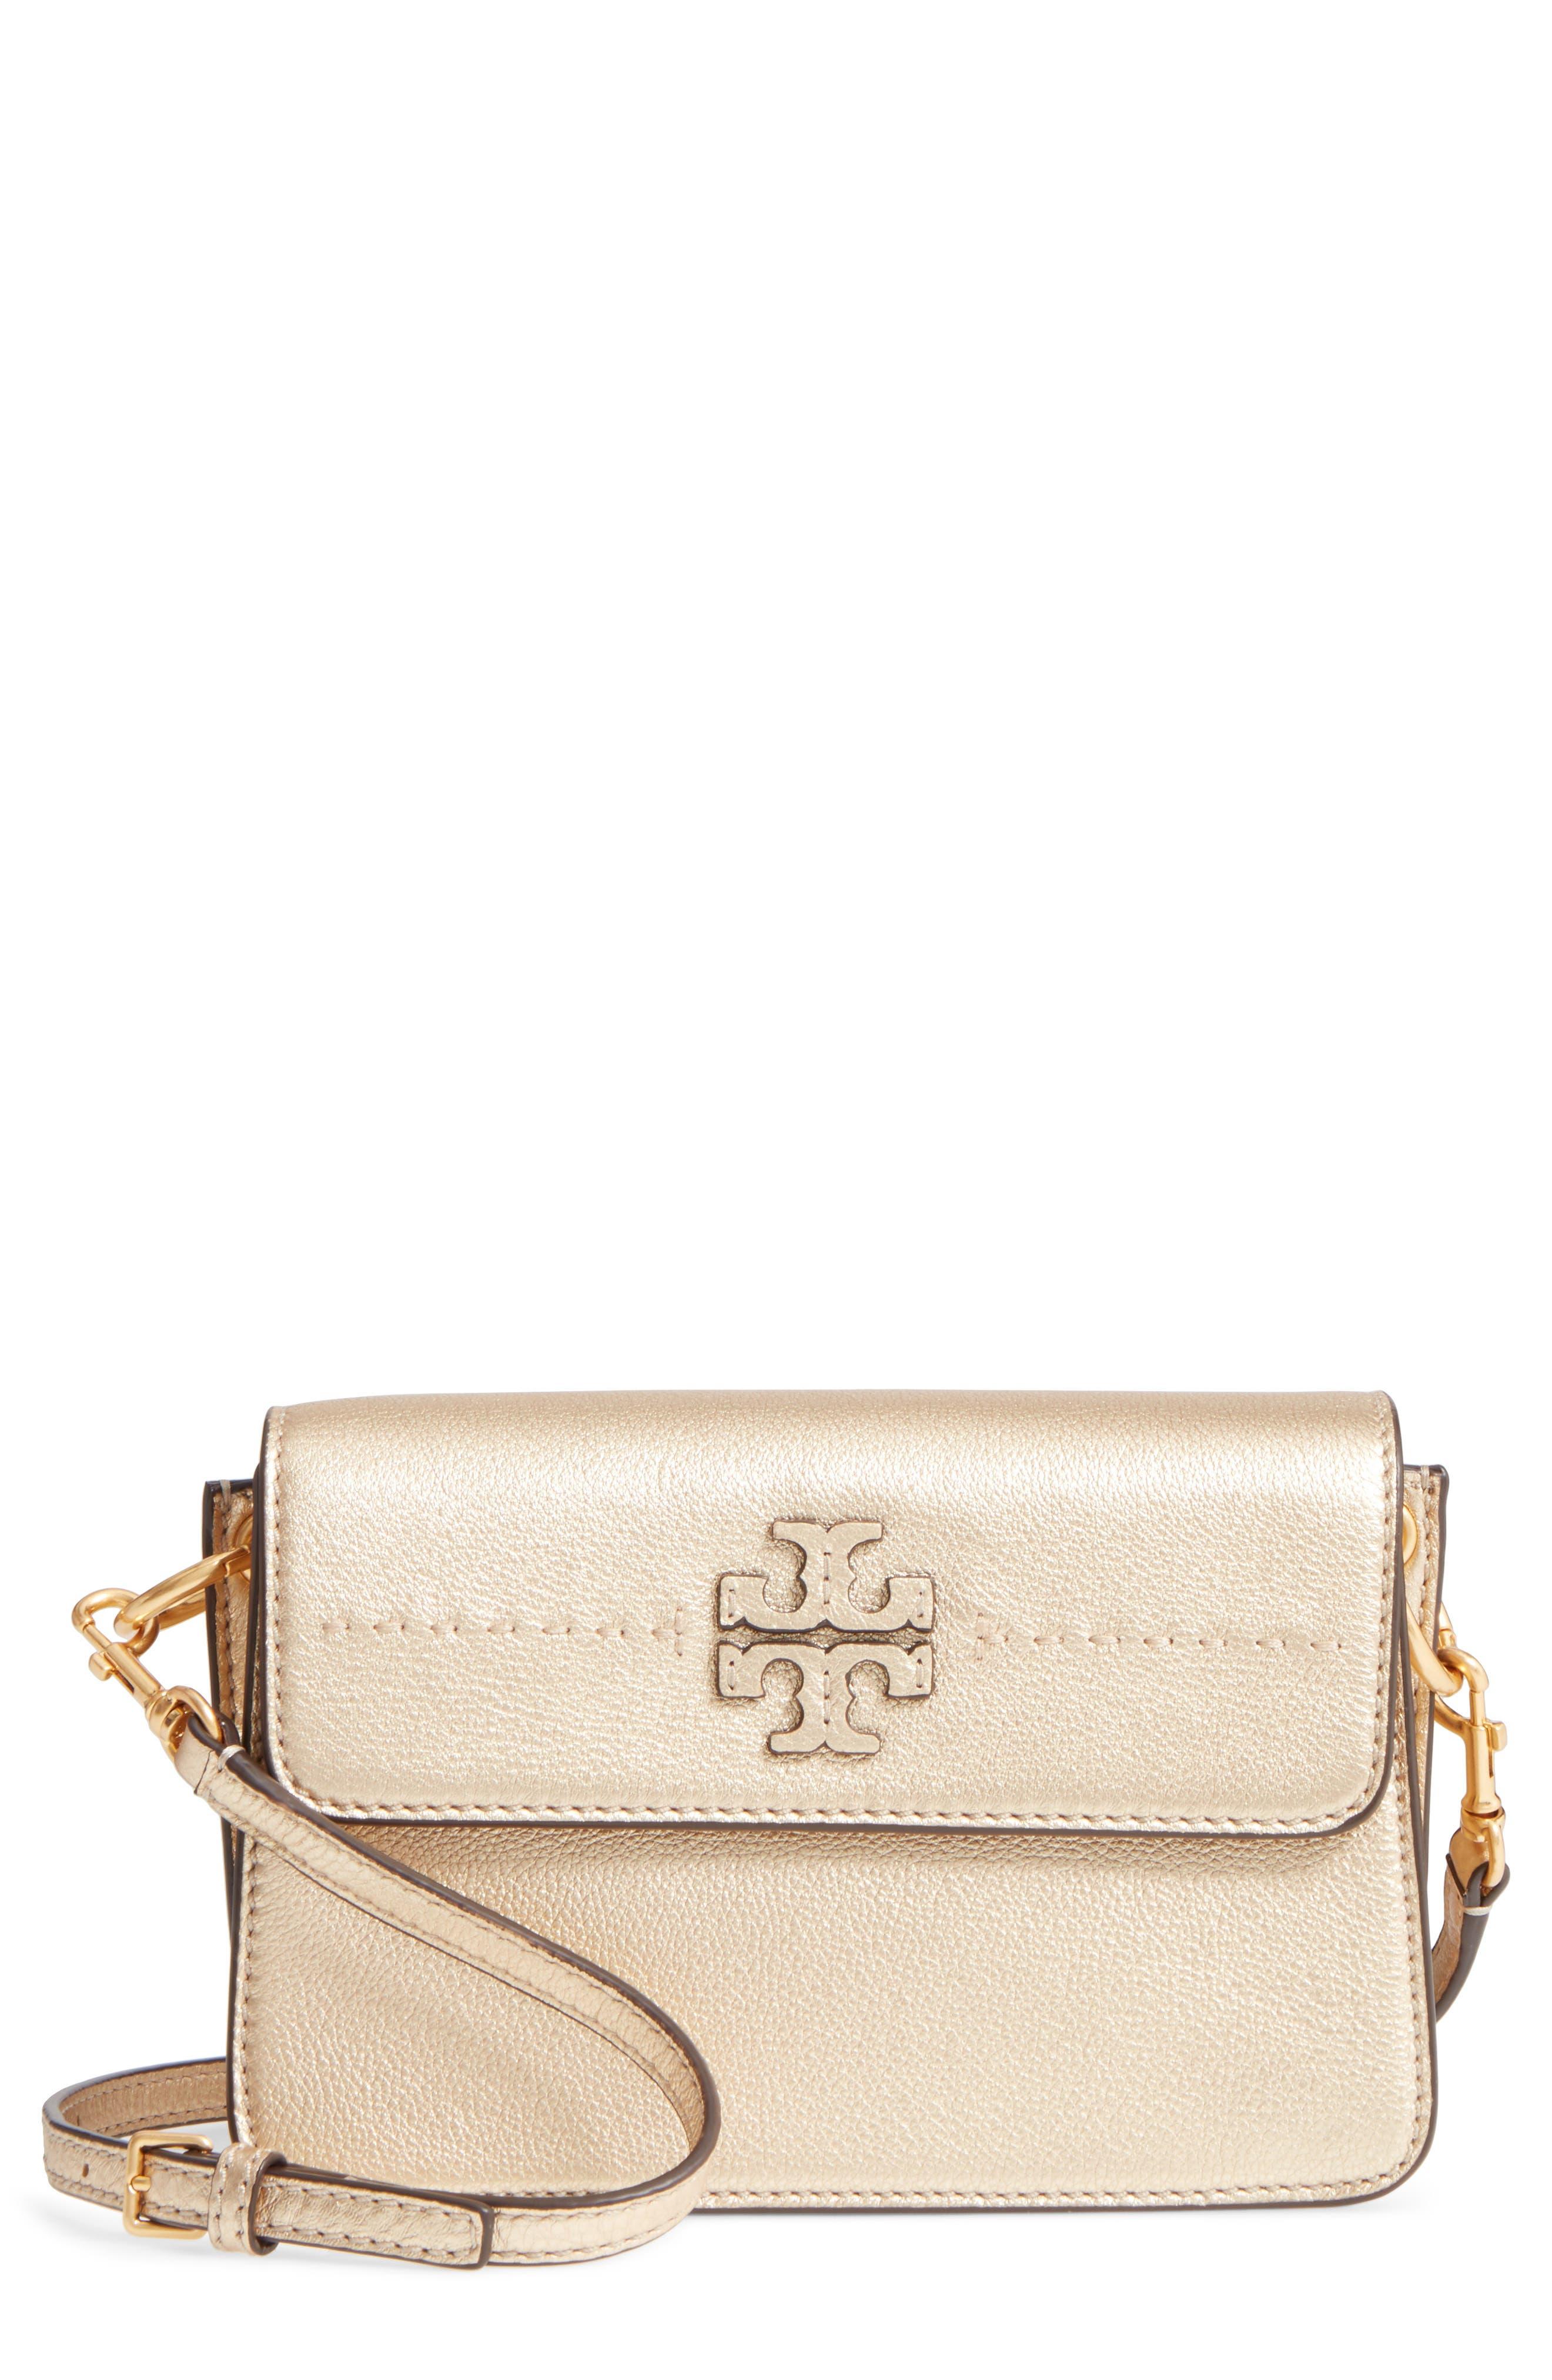 McGraw Metallic Leather Shoulder Bag,                             Main thumbnail 1, color,